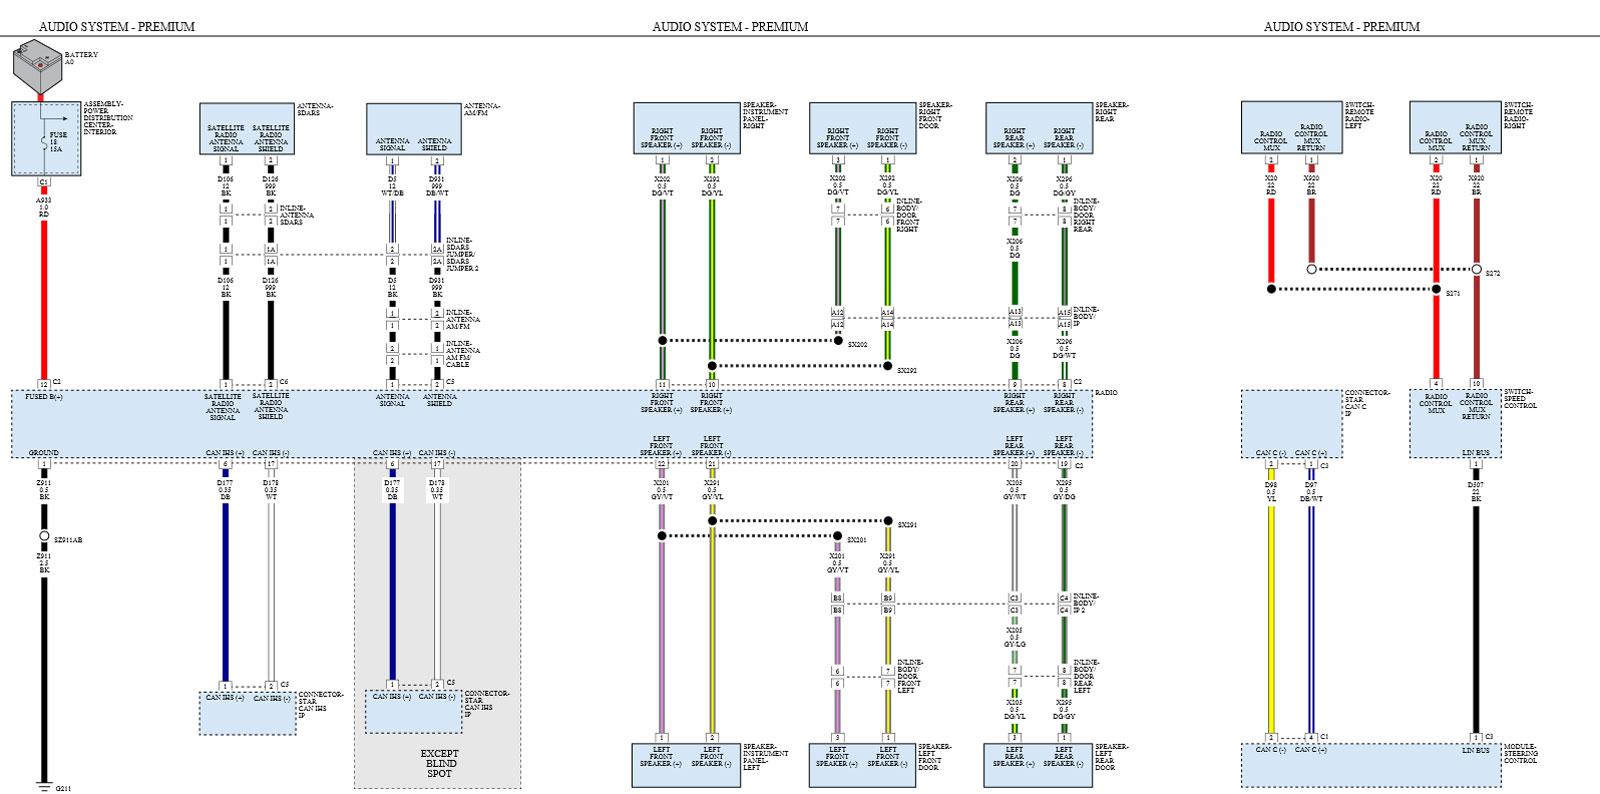 hight resolution of 2013 dodge dart wiring diagram active shutters wiring library2013 dodge dart wiring diagram active shutters